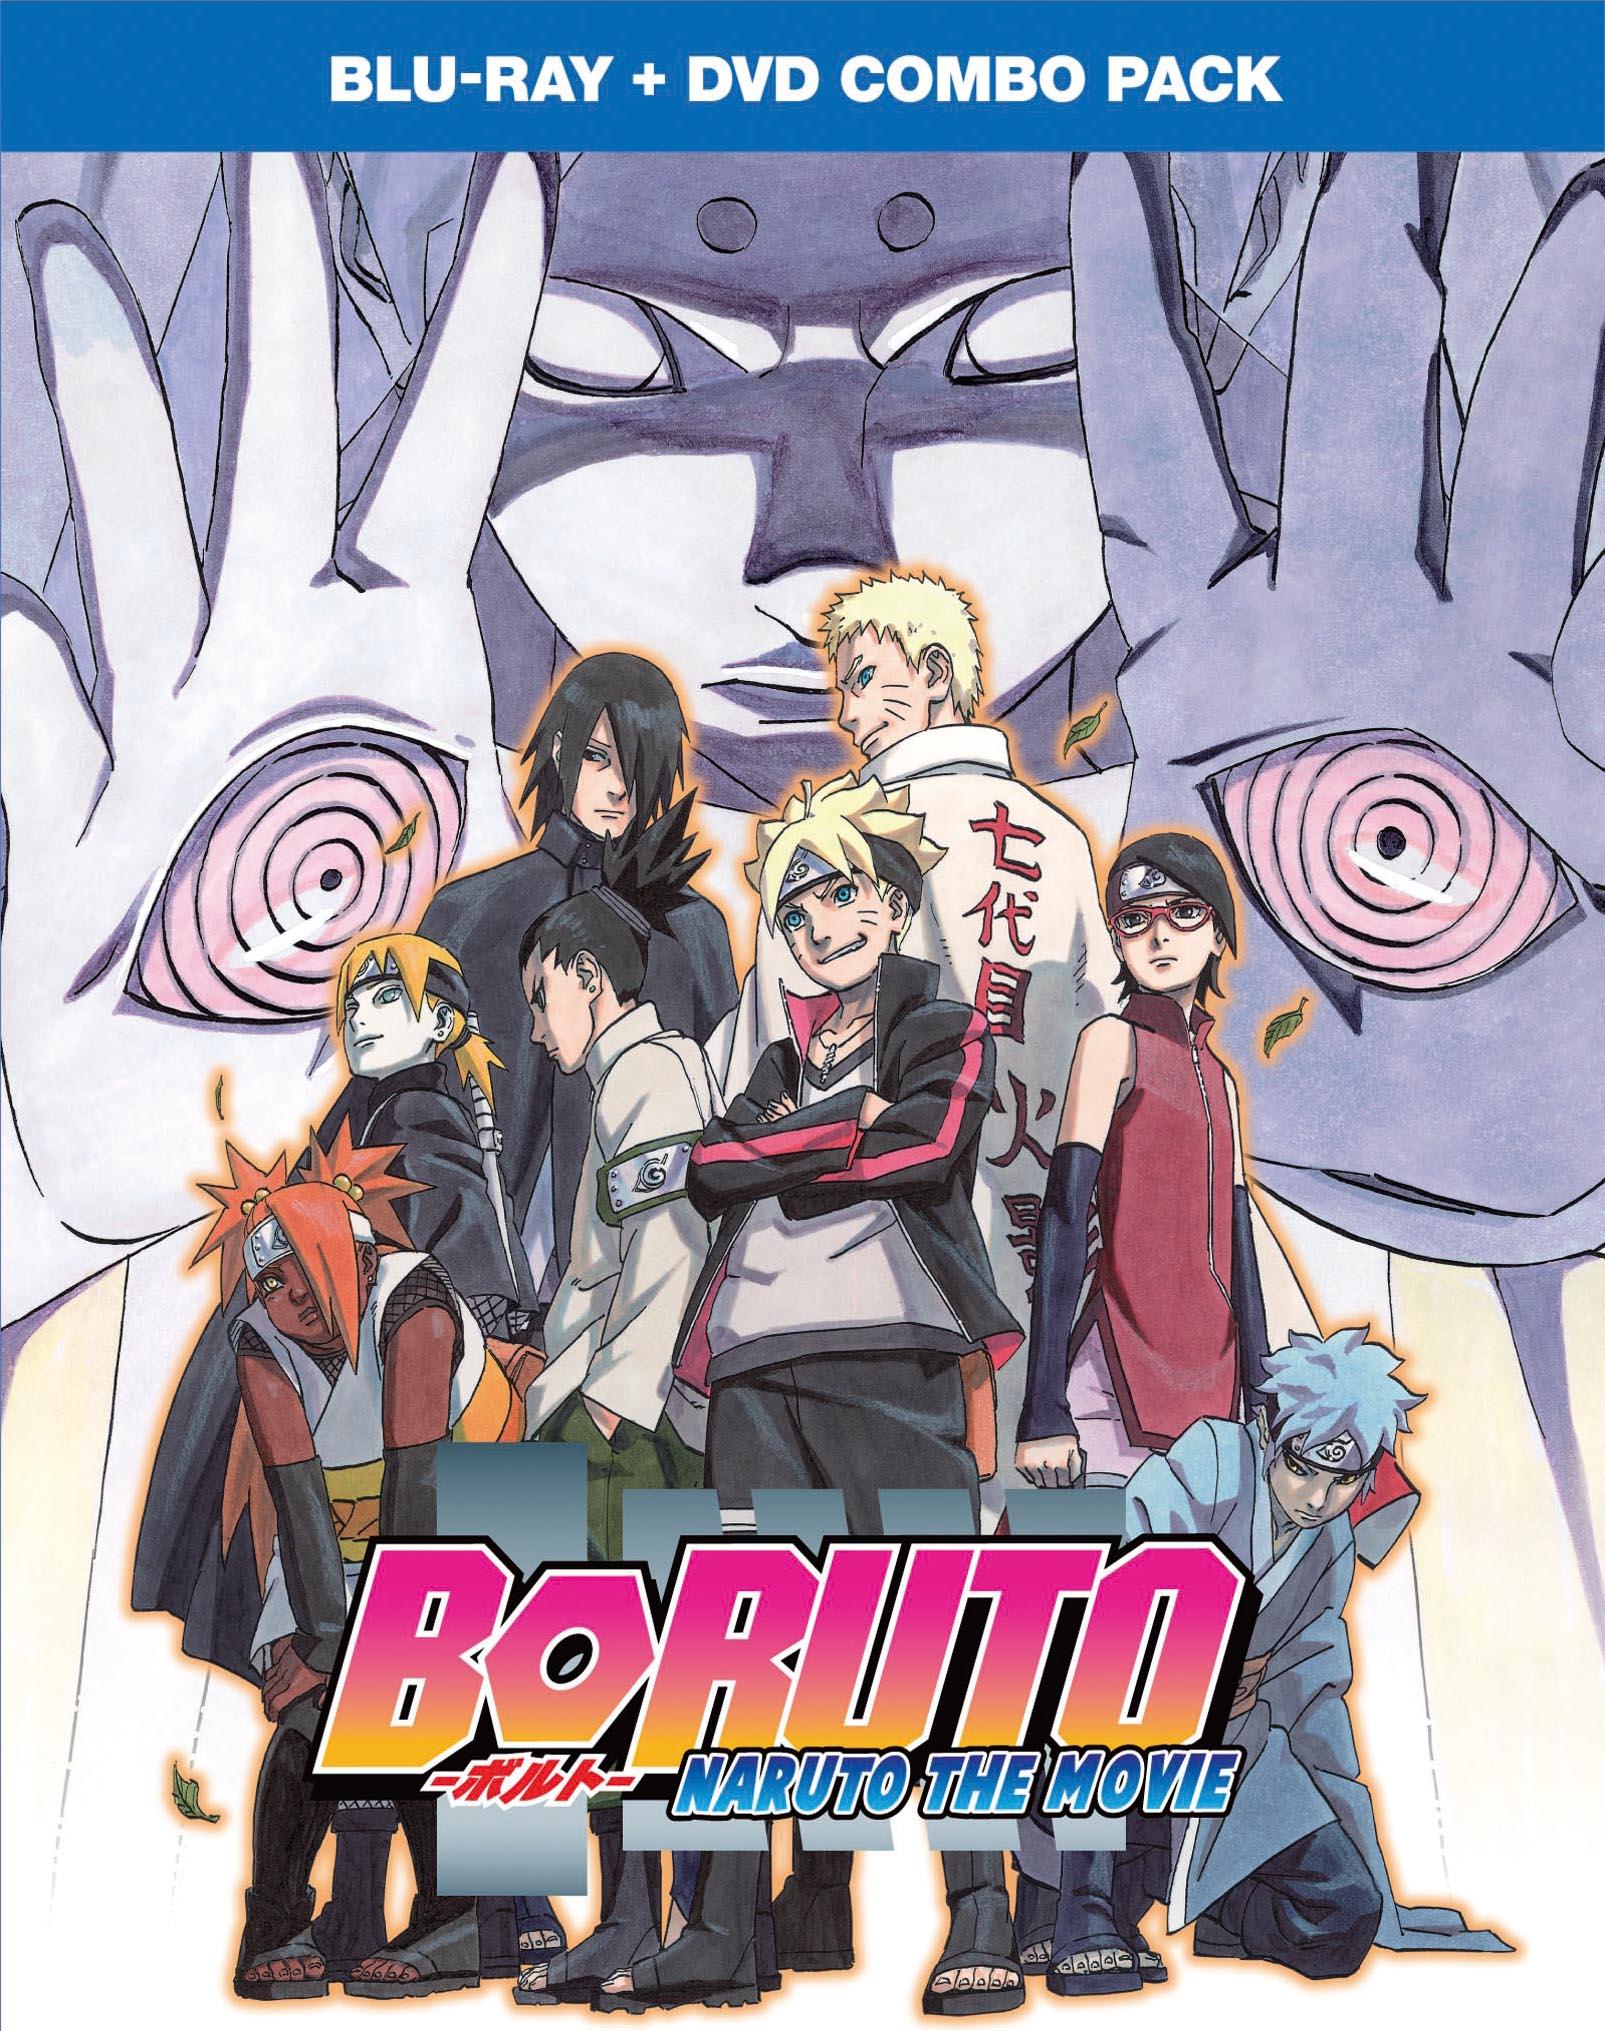 VIZ | The Official Website for Boruto: Naruto Next Generations